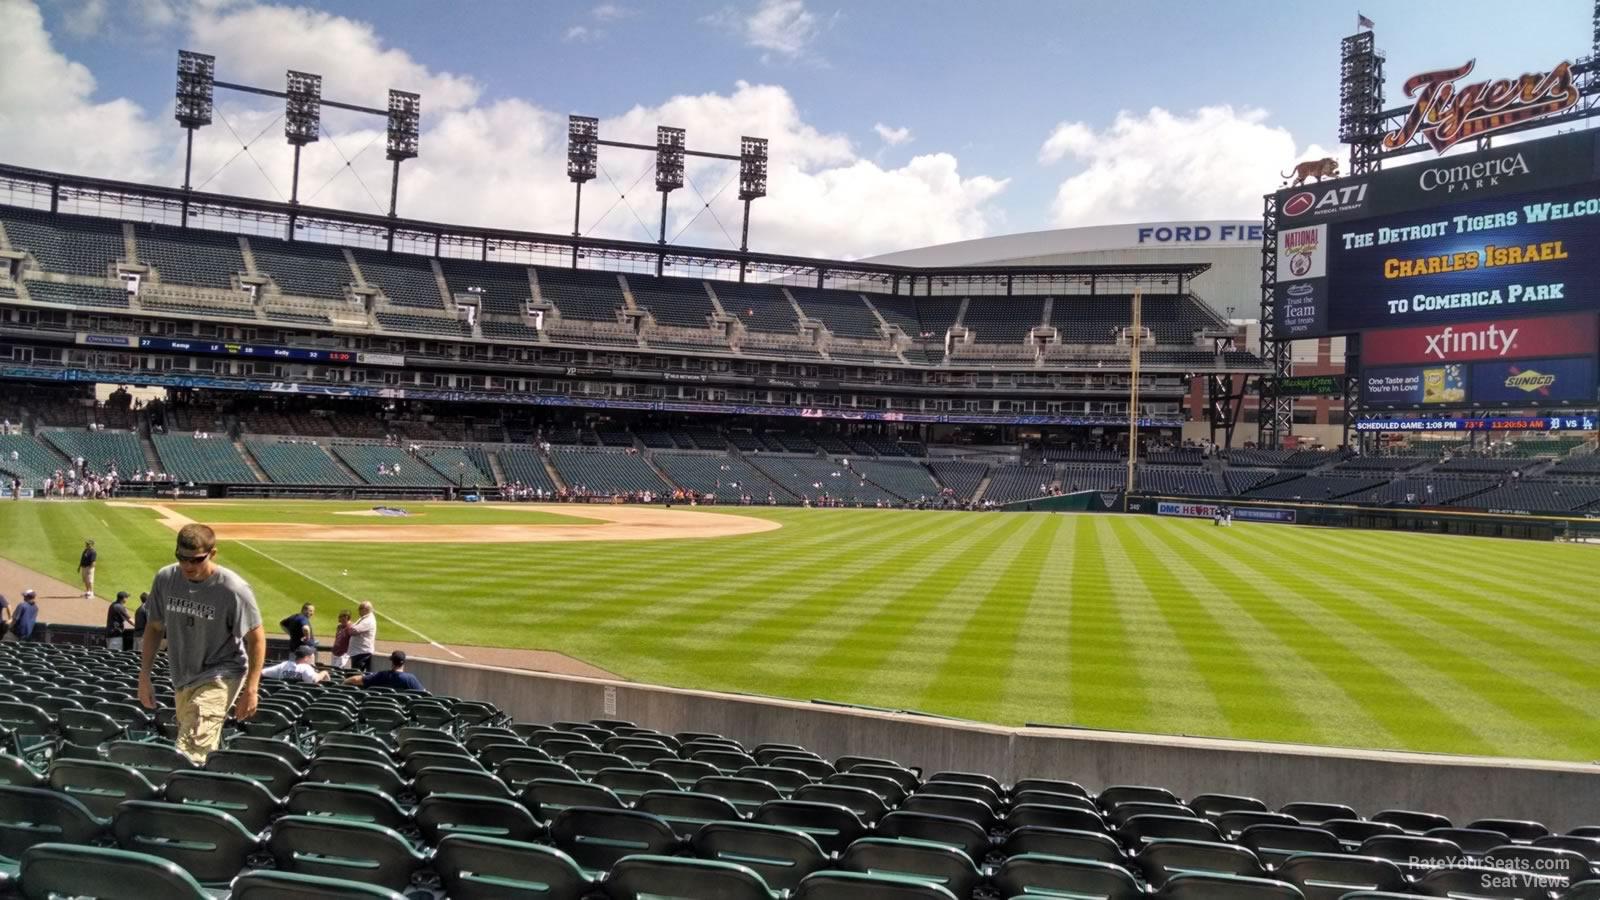 Comerica Park Section 112 - Detroit Tigers - RateYourSeats.com